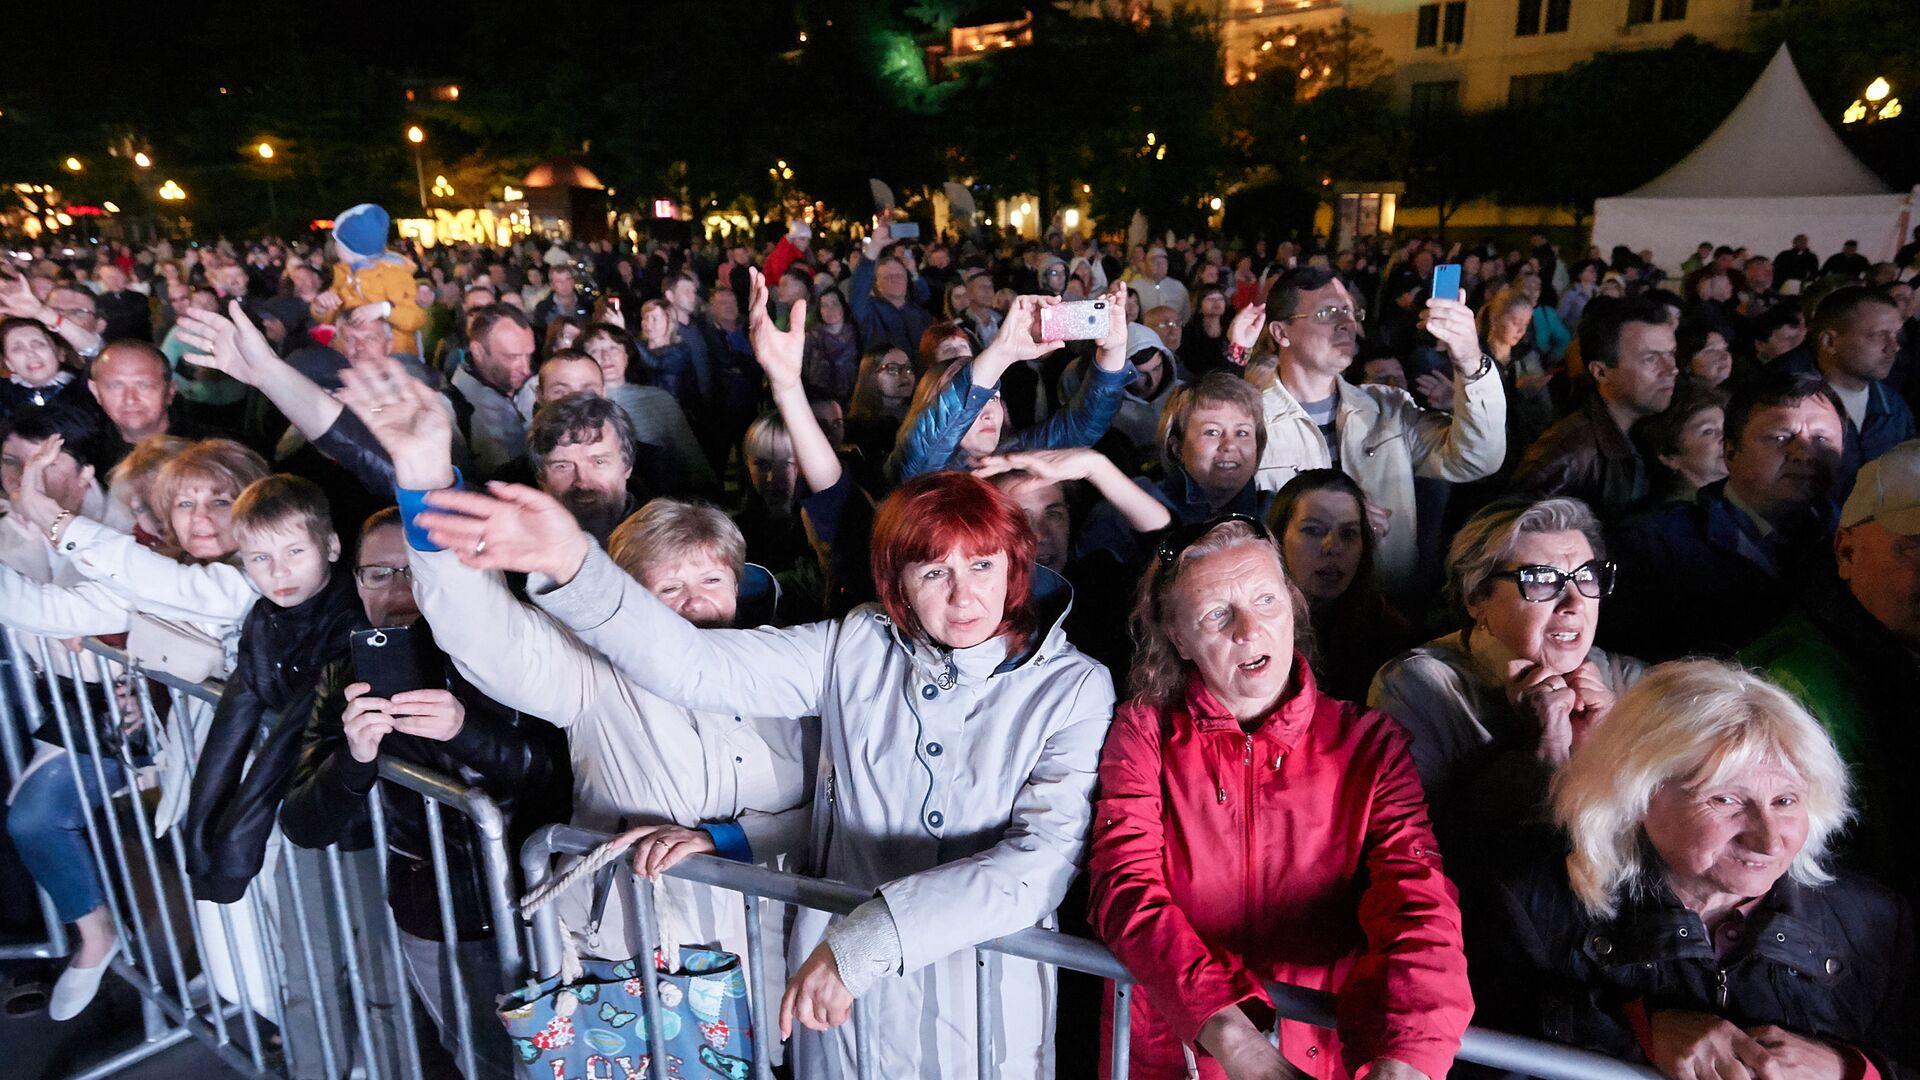 Зрители на концерте в Ялте в 2019 году - Sputnik Тоҷикистон, 1920, 04.10.2021